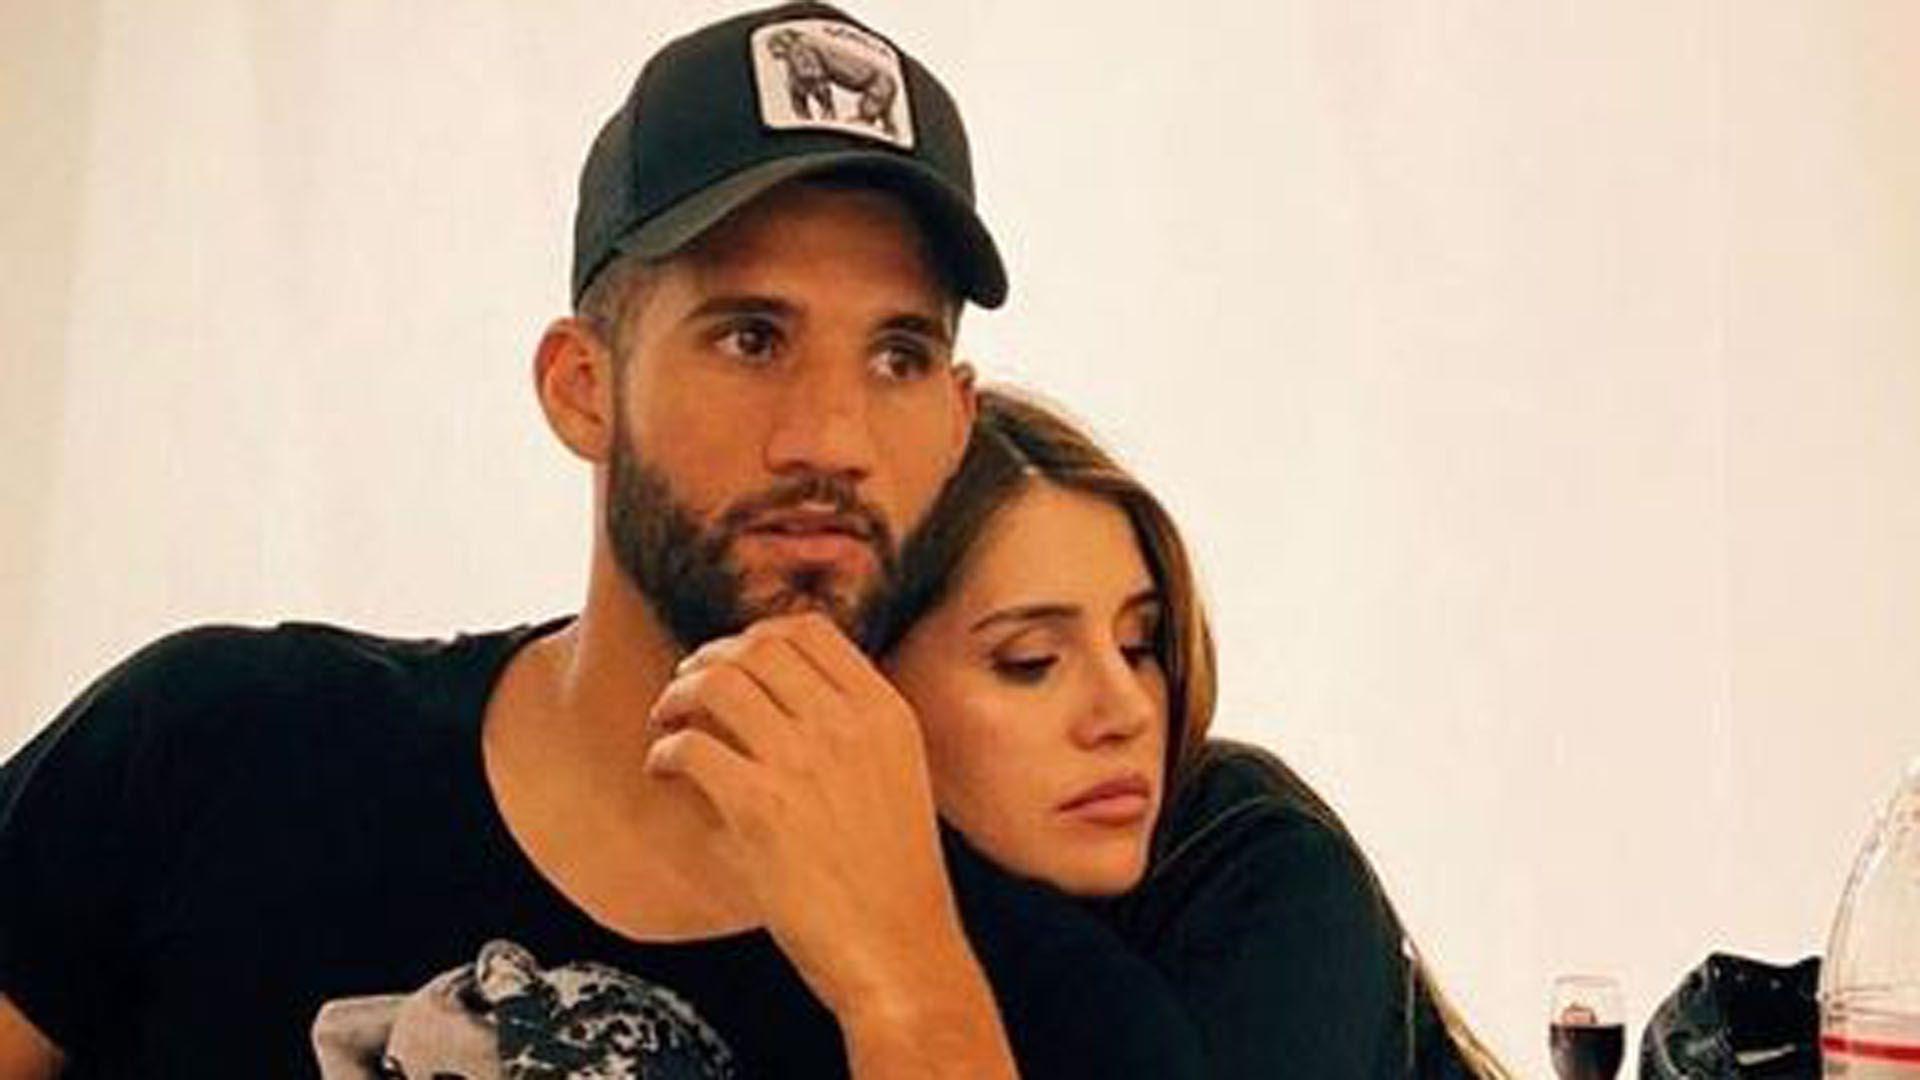 Mica Tinelli 2ubicó a una actriz porno que coqueteó con Lisandro López